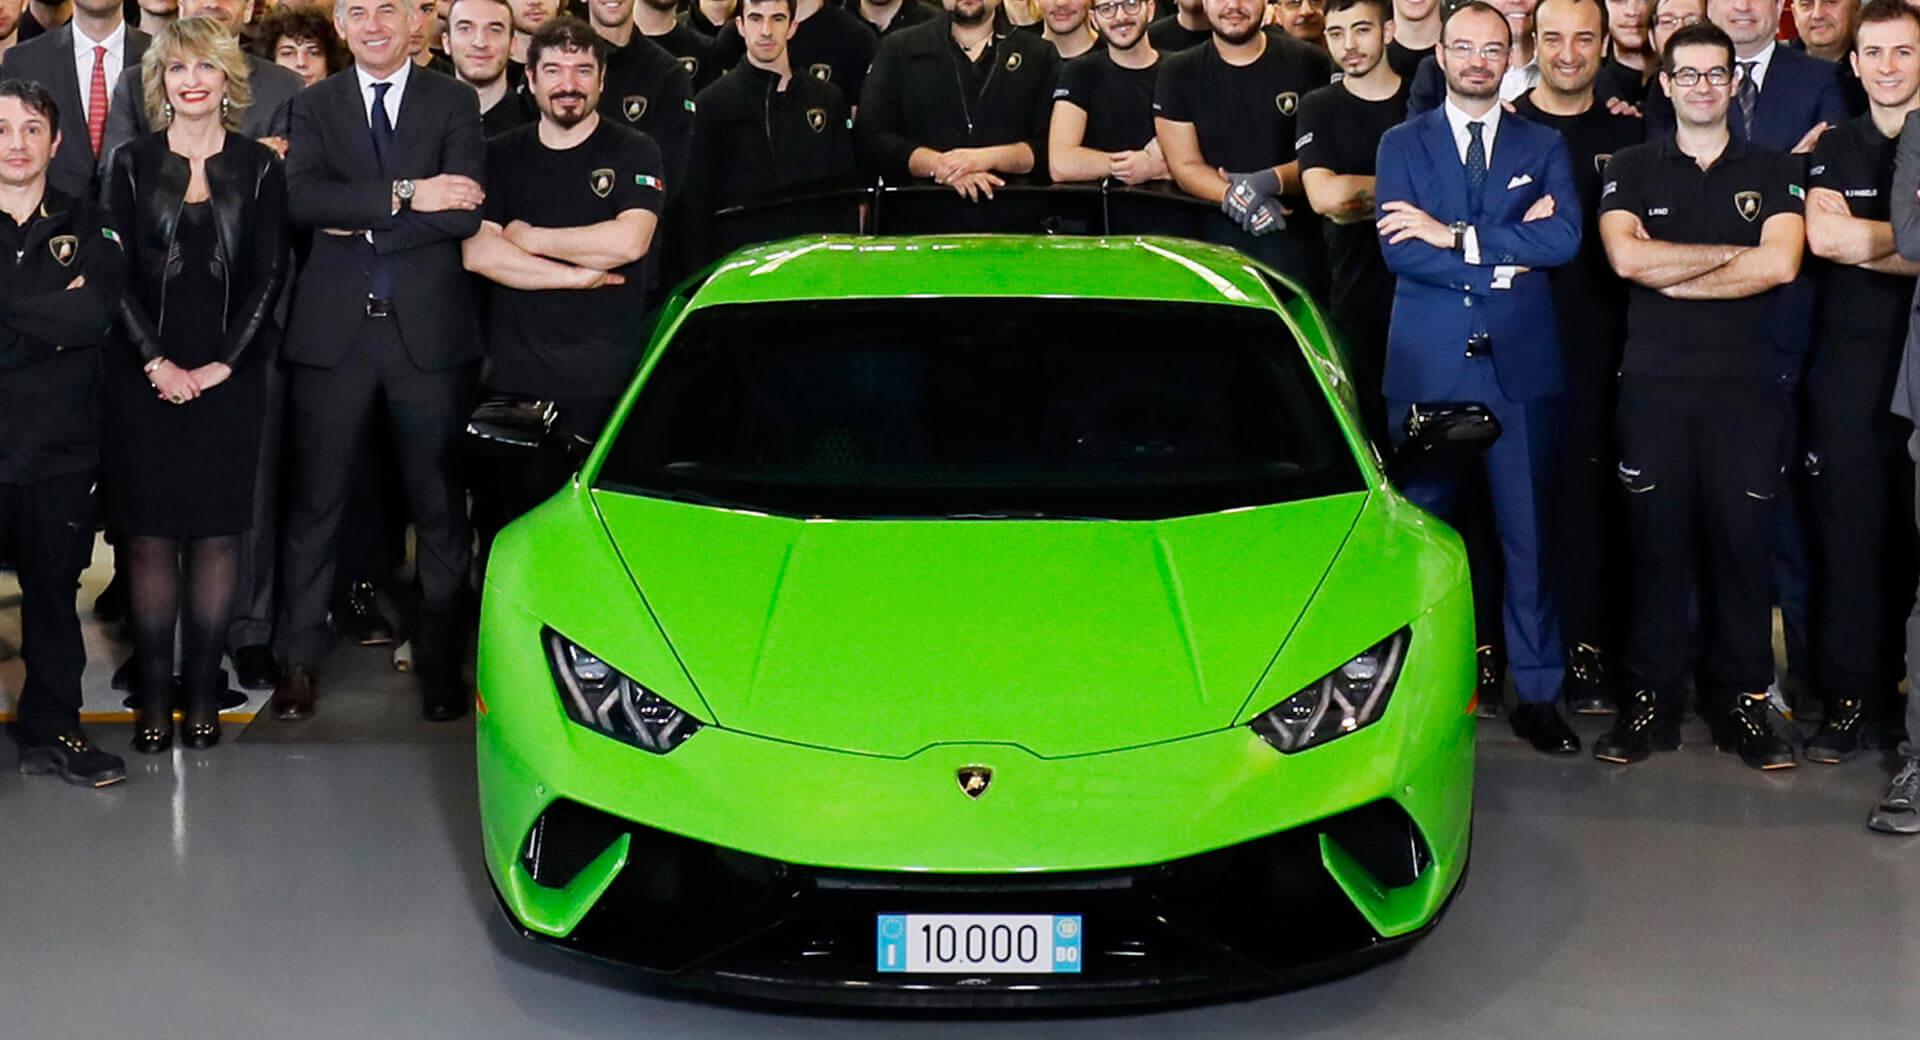 Lamborghini a atins un nou record de producţie. Fabrica din Sant'Agata Bolognese duduie